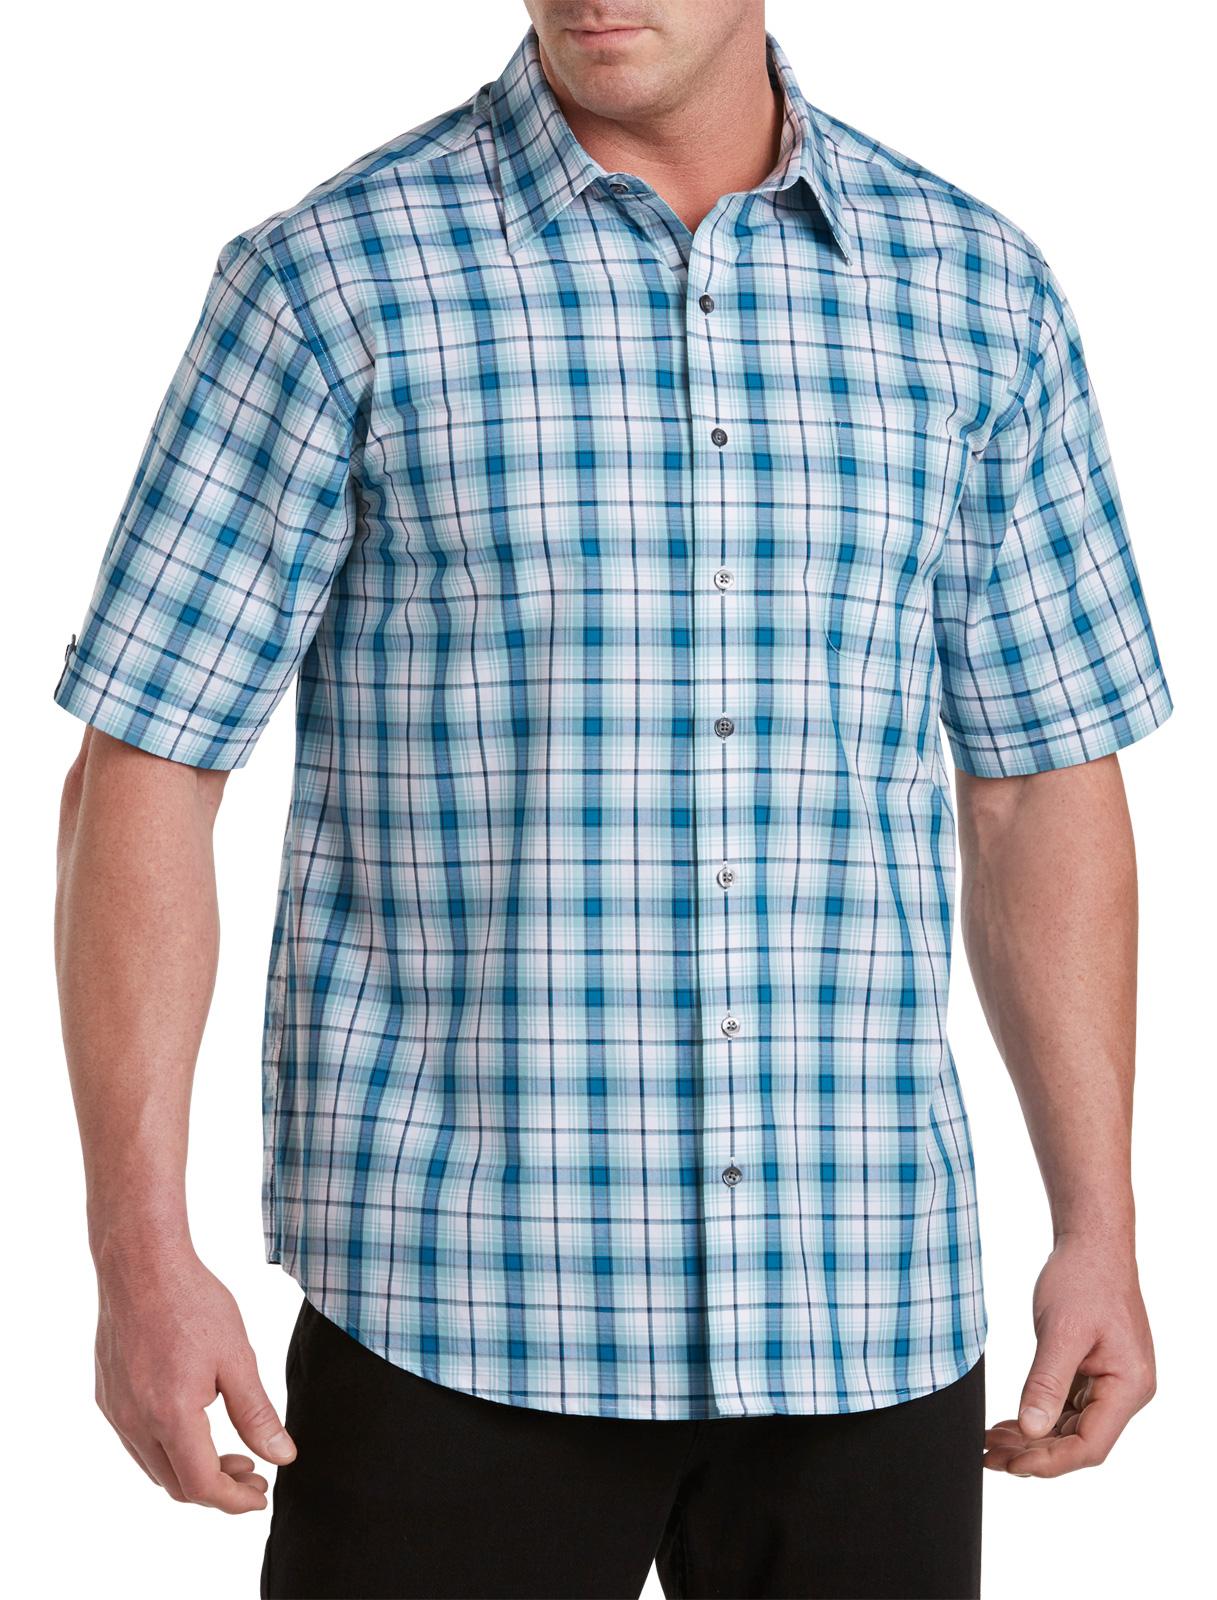 Synrgy Men's Big and Tall Medium Plaid Sport Shirt